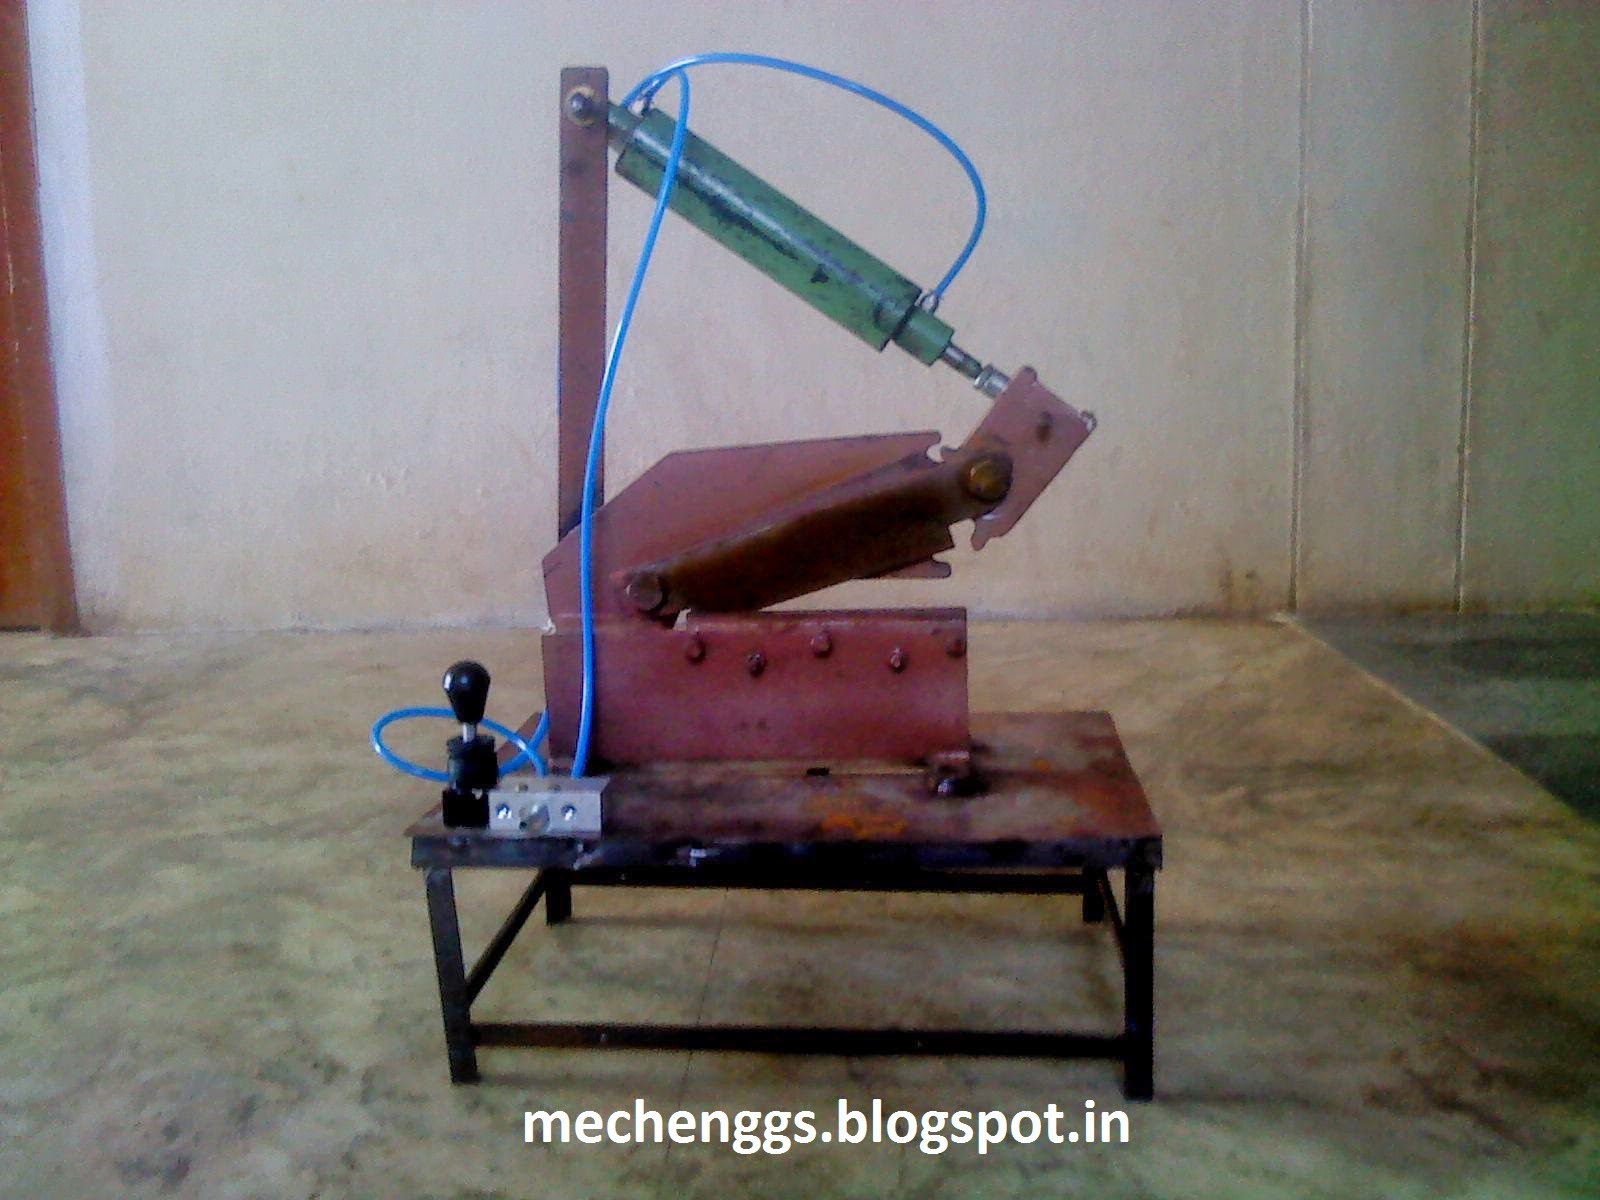 PROJECT ON PNEUMATIC SHEET METAL CUTTING MACHINE